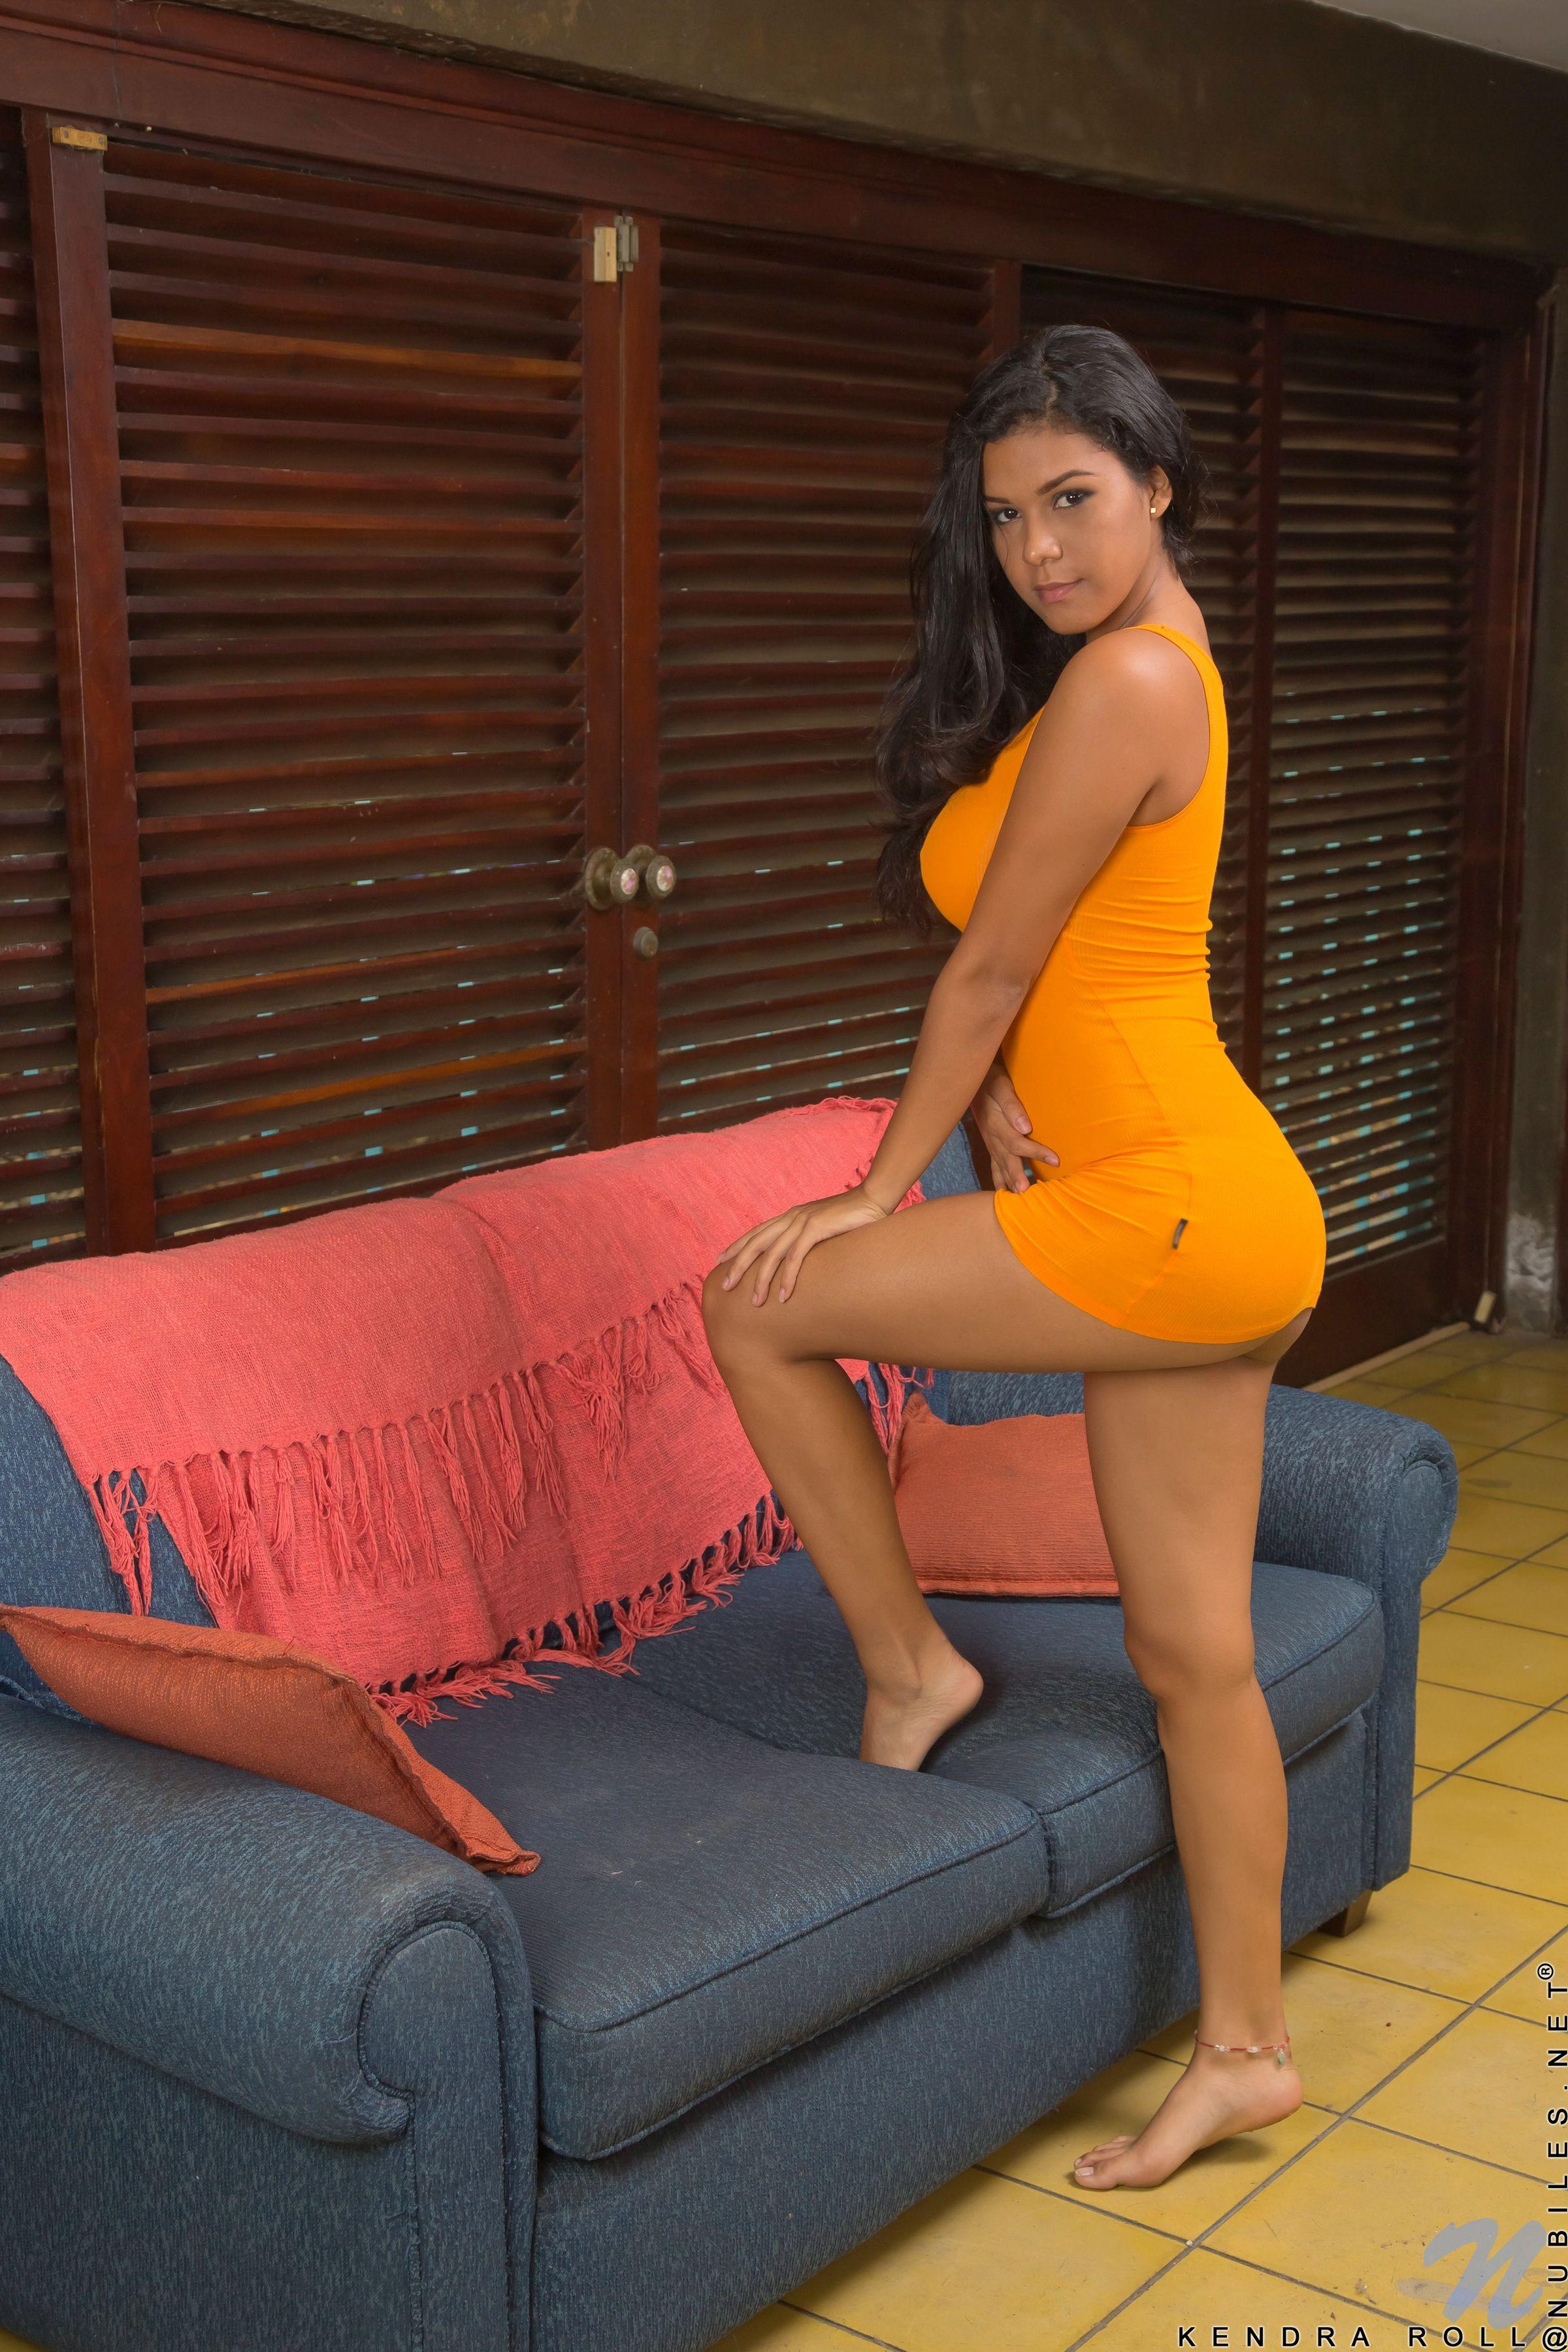 Kendra Roll Nude Photos 72